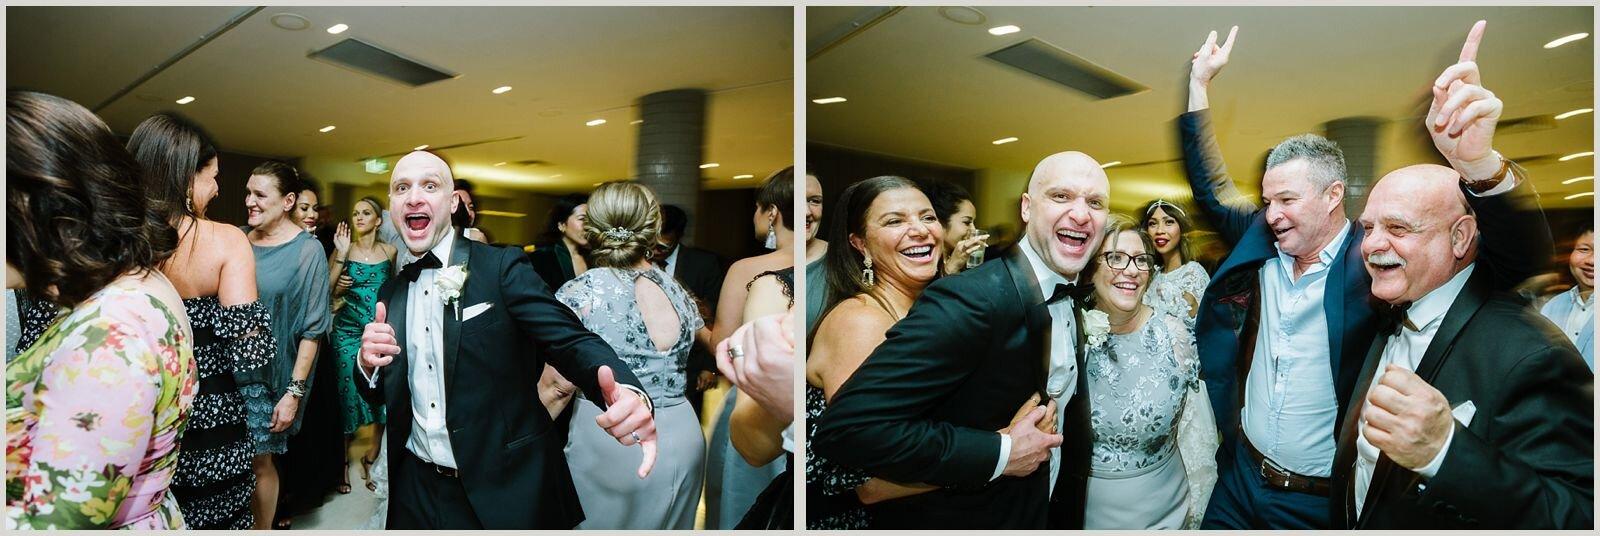 joseph_koprek_wedding_melbourne_the_prince_deck_0083.jpg